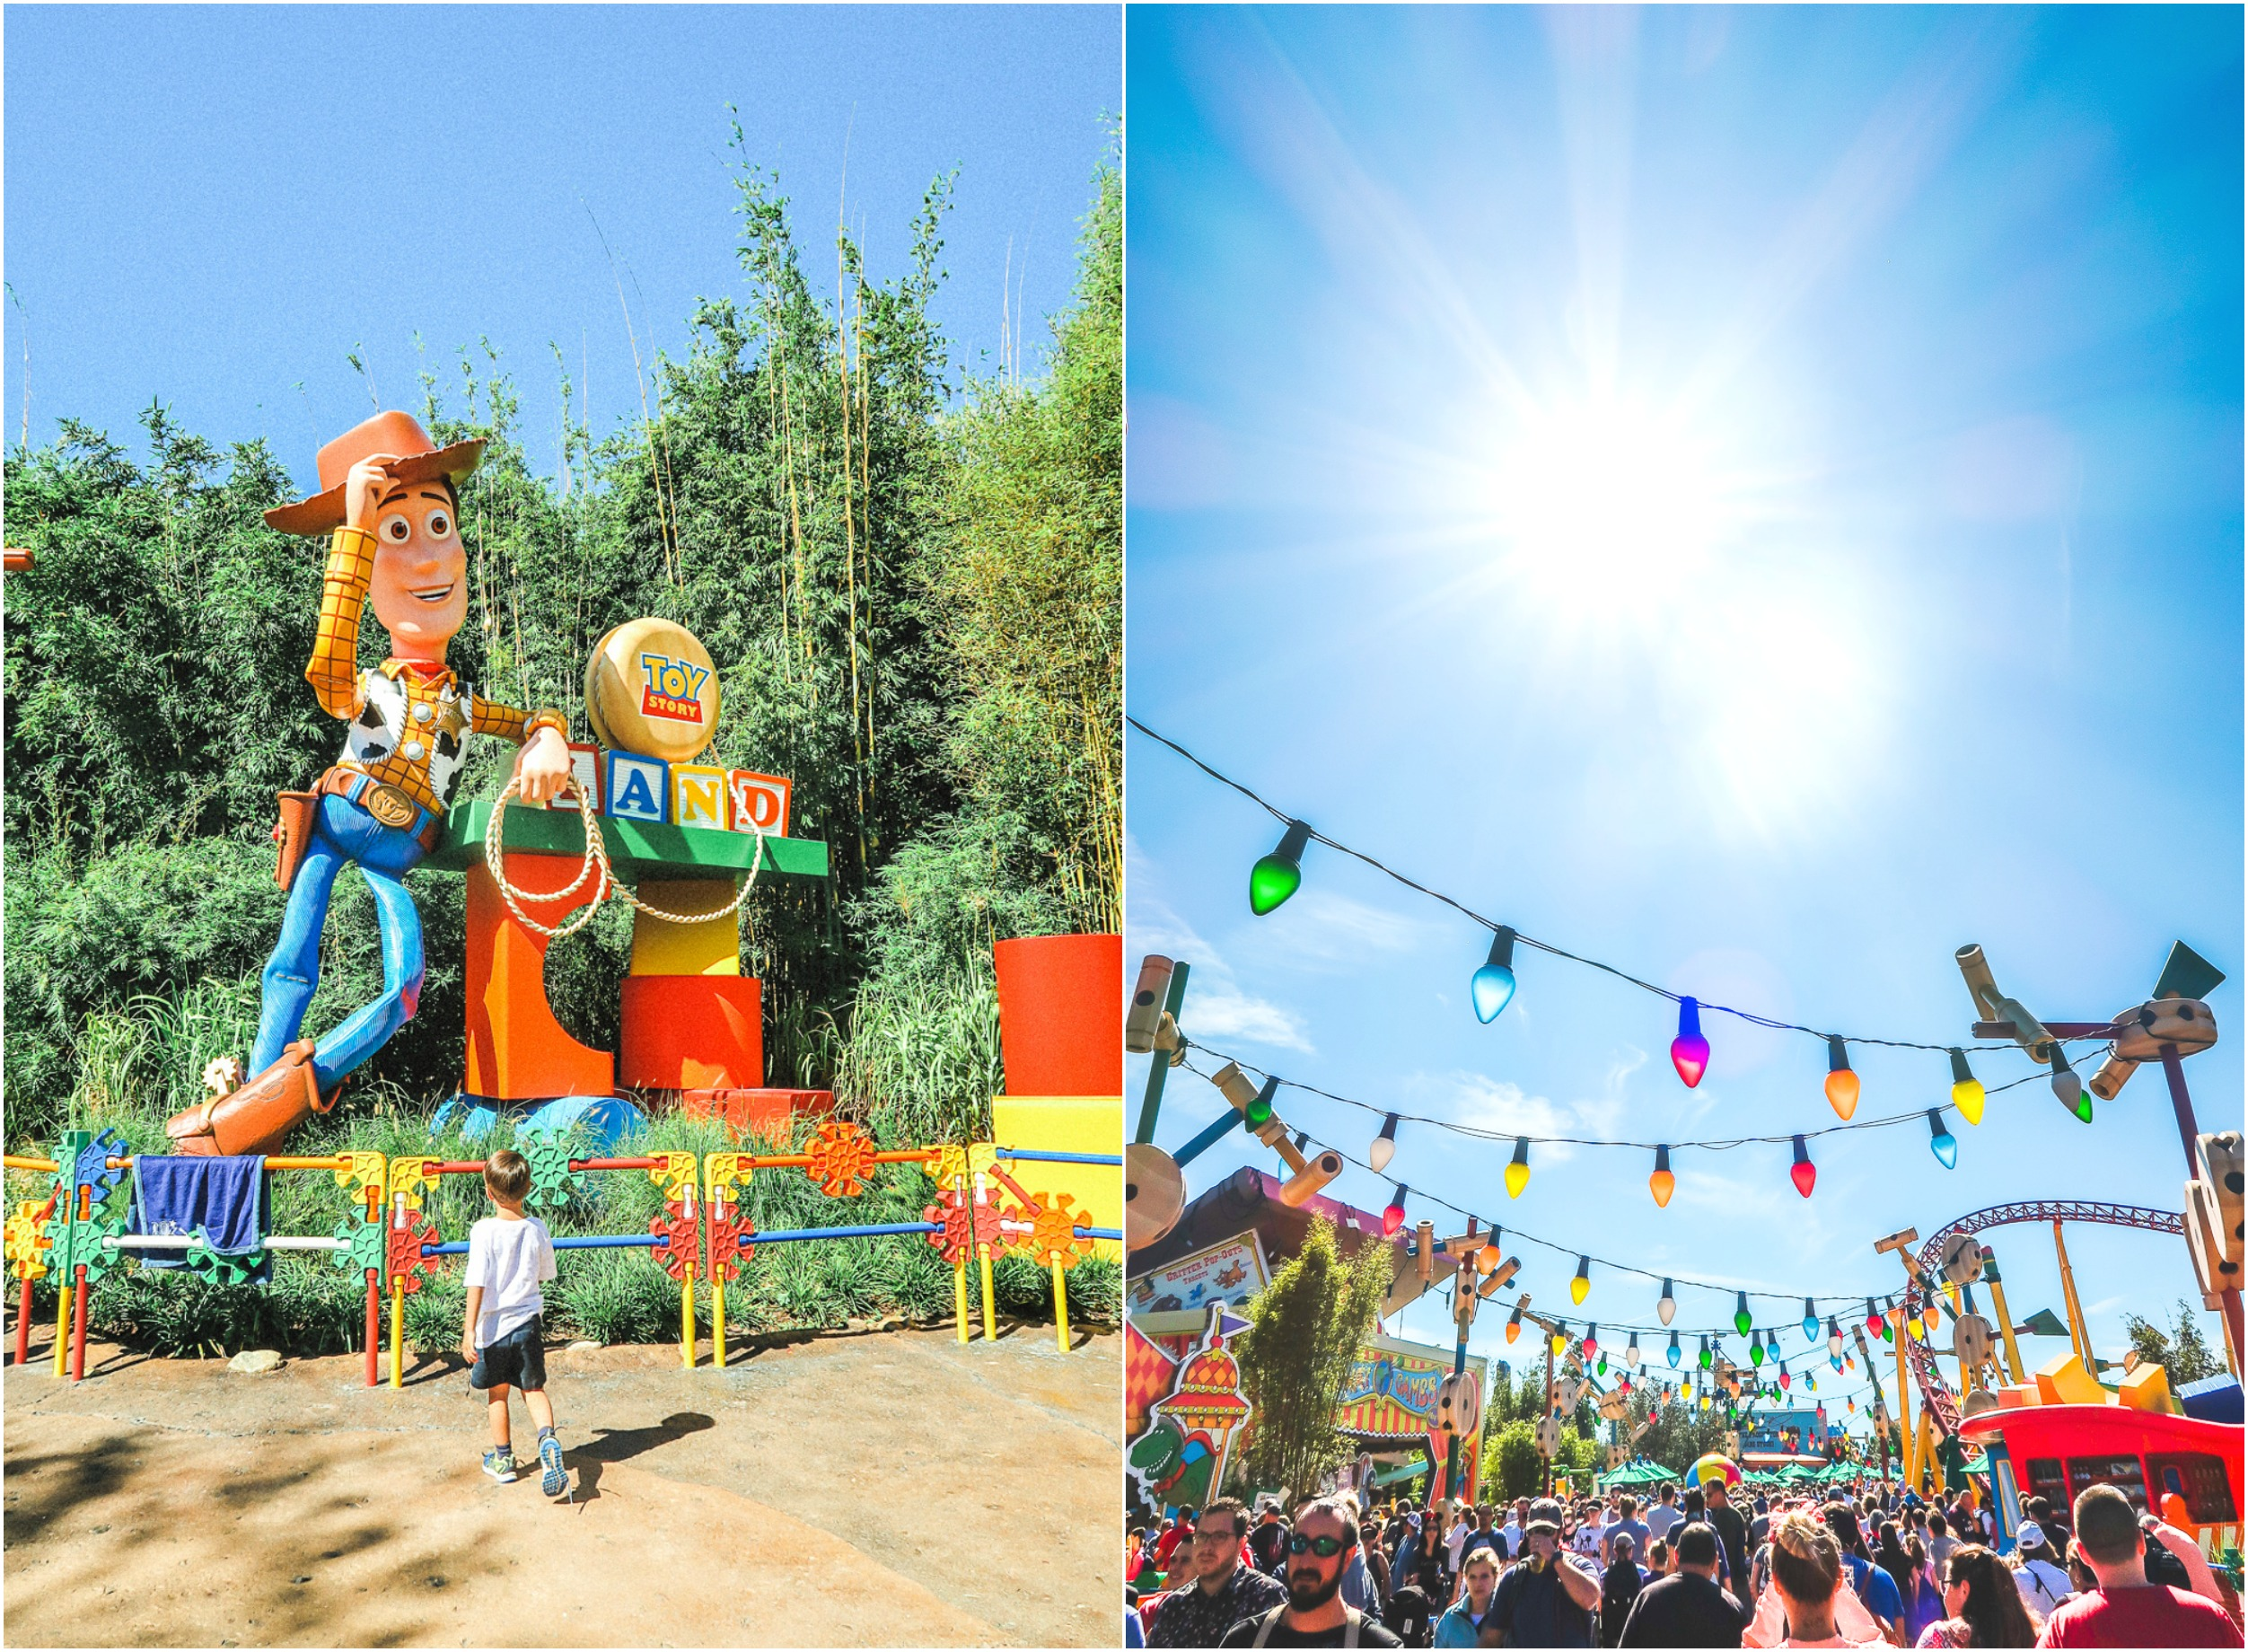 Toy Story Land Travel Disney's Universal Studios